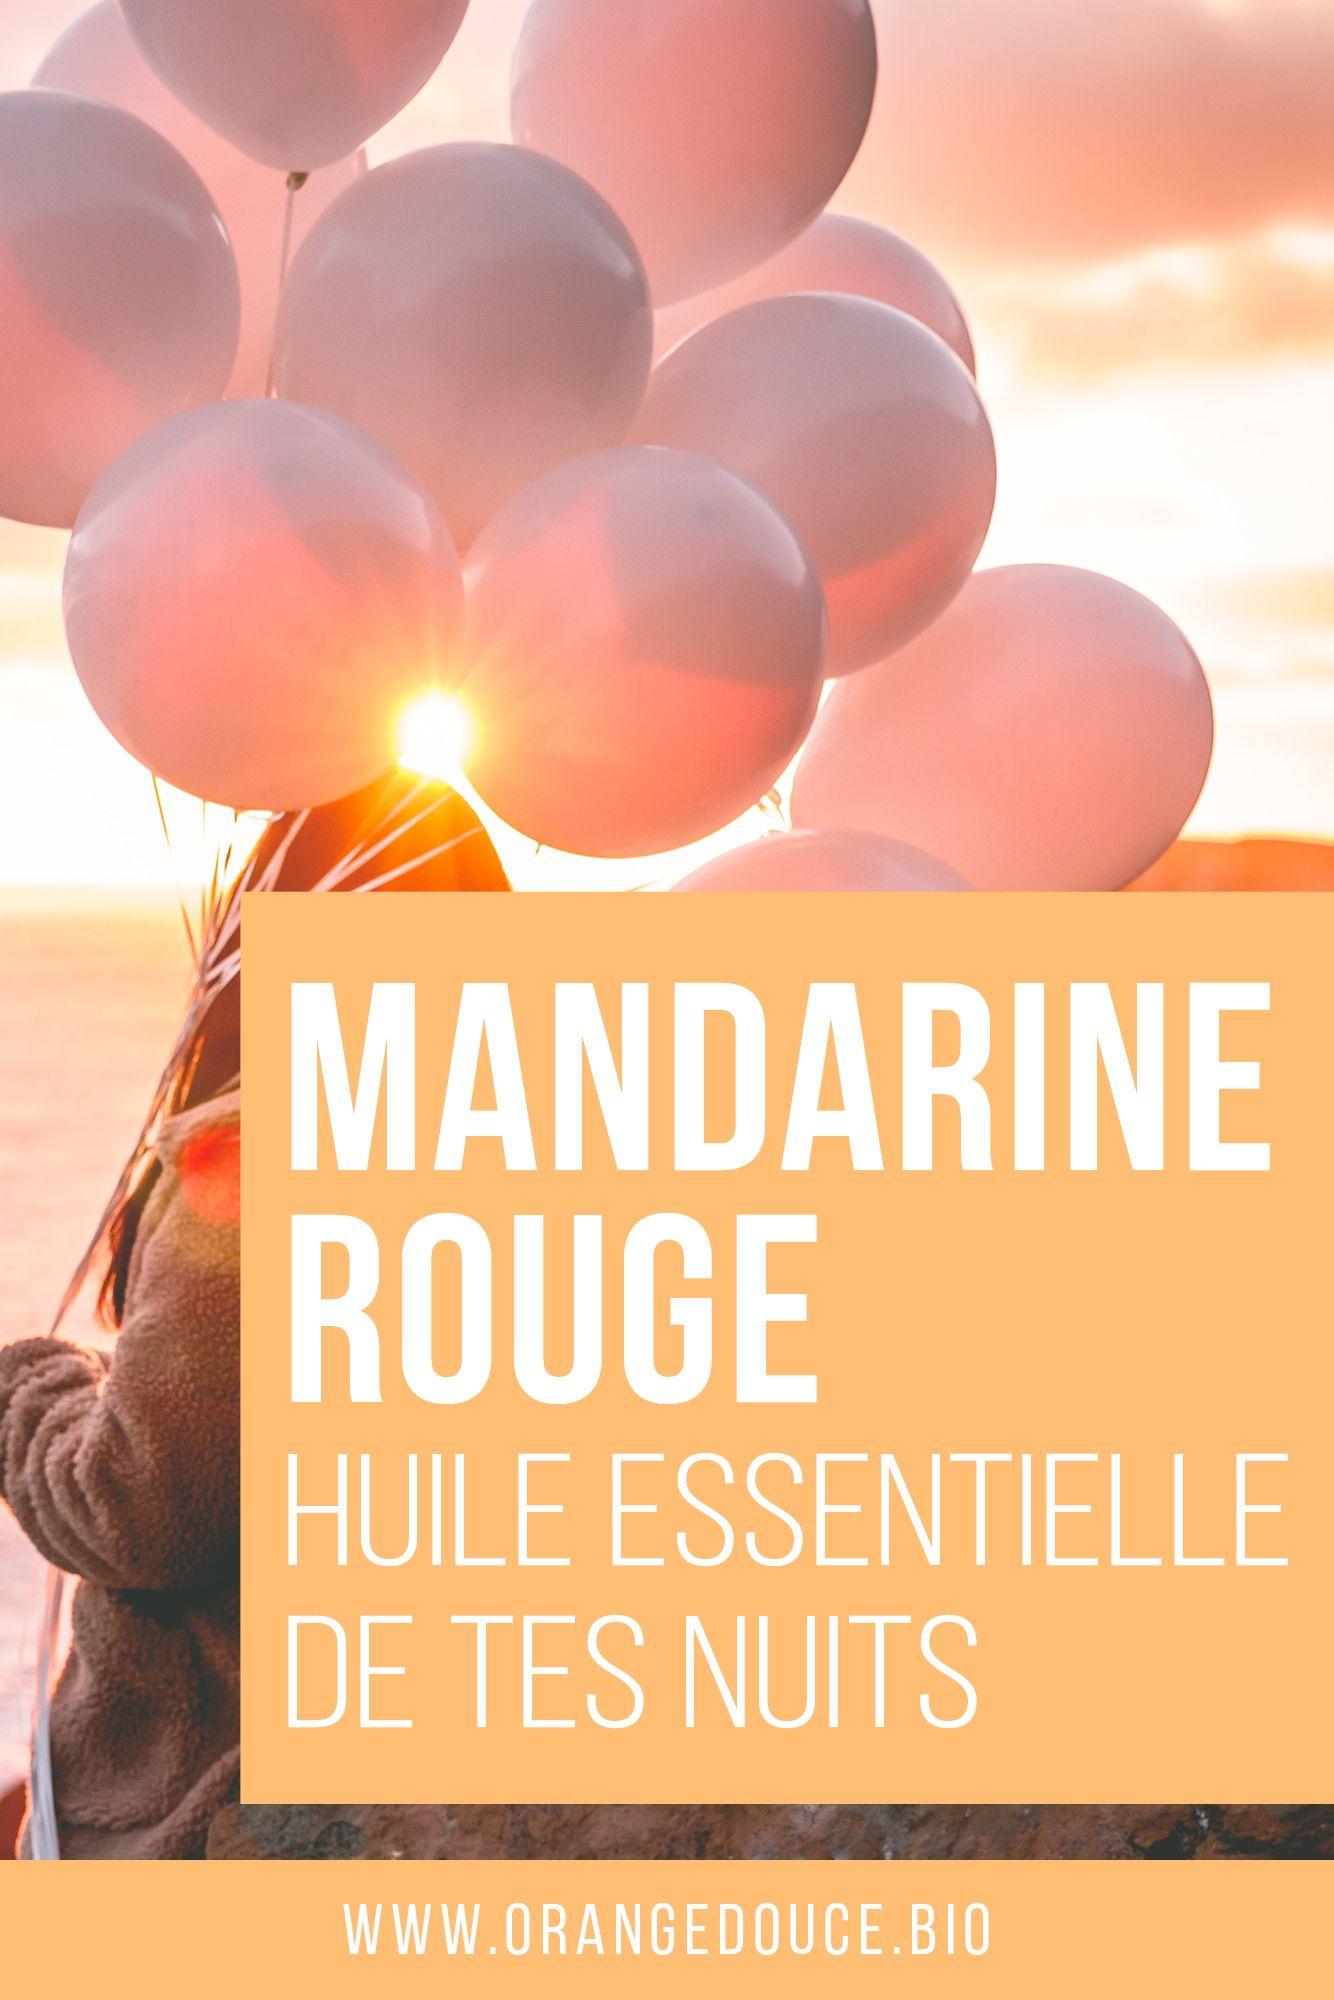 La Mandarine Rouge Doudou De Tes Nuits En 2020 Naturopathie Huile Essentielle Mandarine Medecine Naturelle